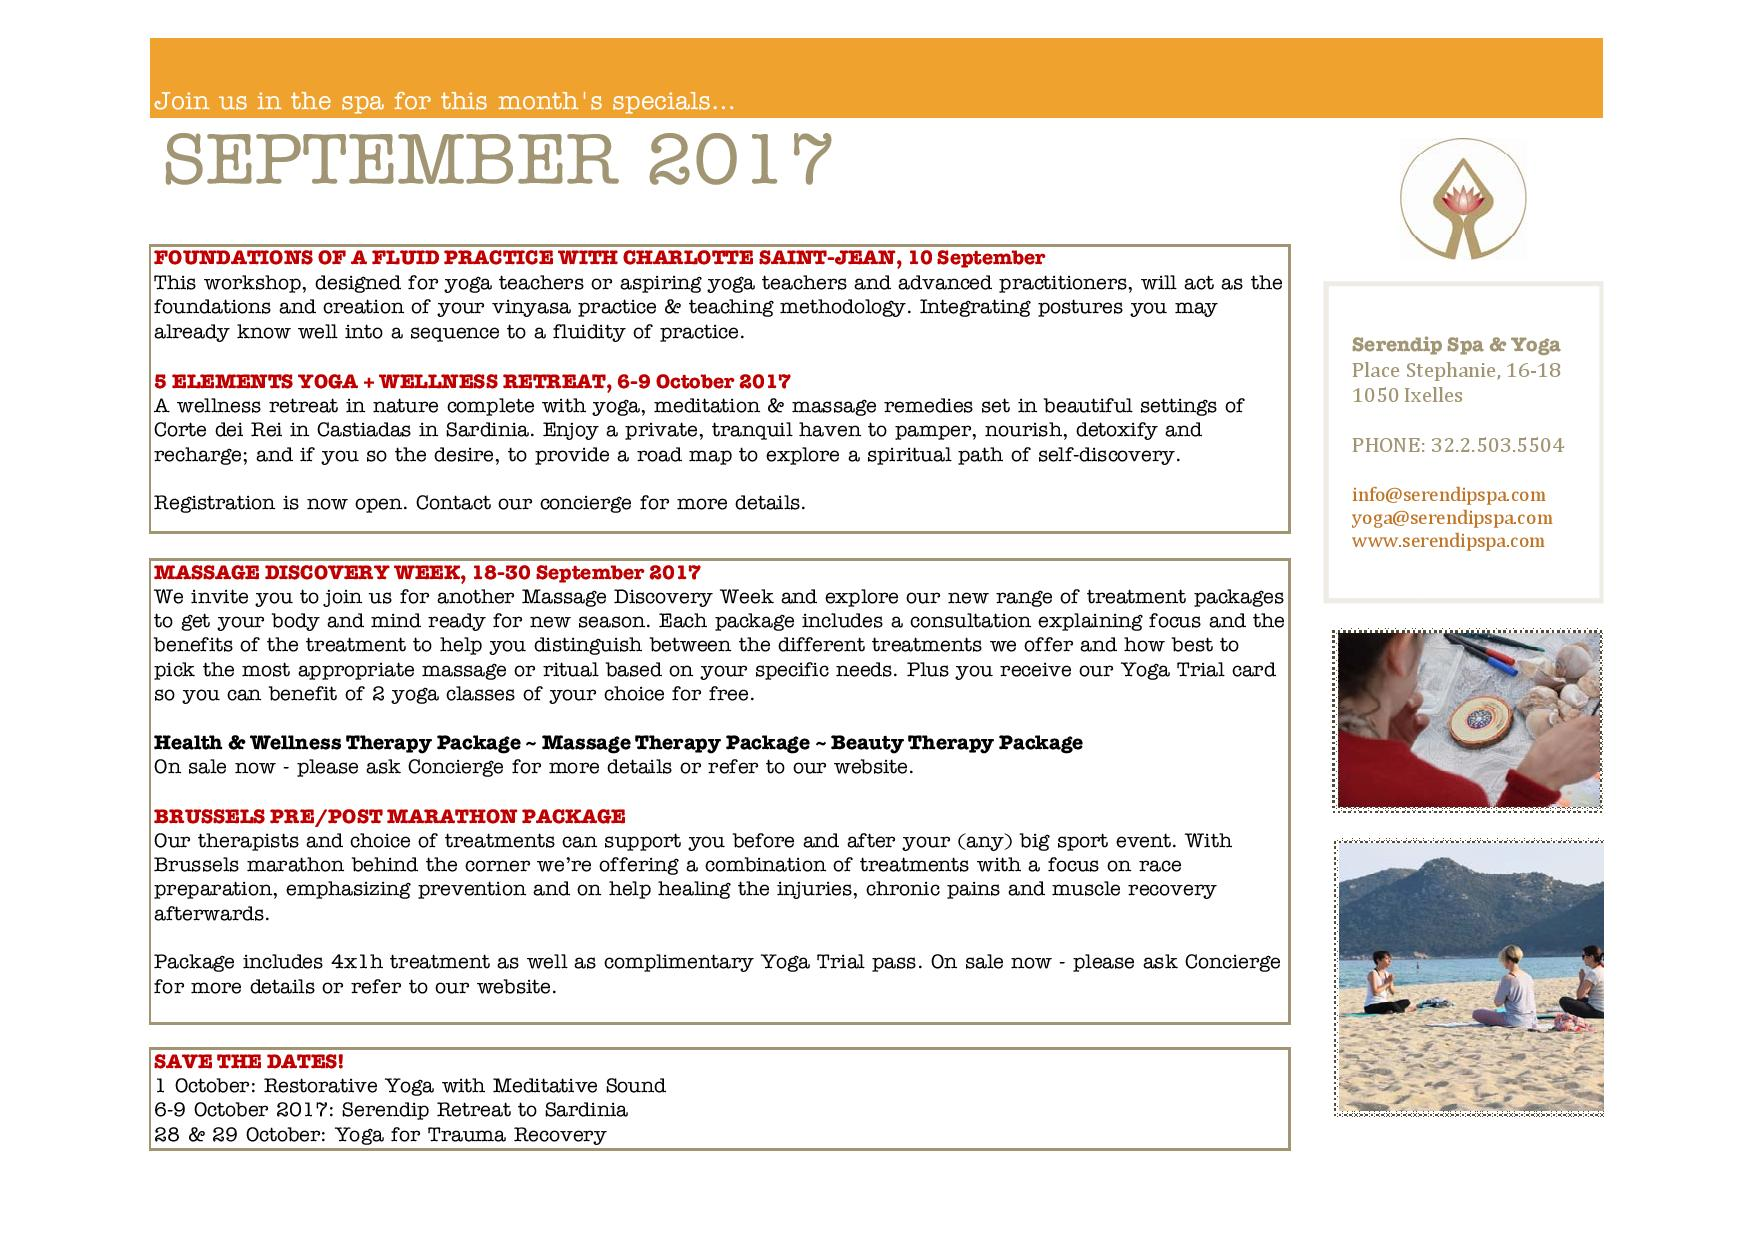 serendip spa and yoga calendar 2017_September A4 BACK-page-001.jpg